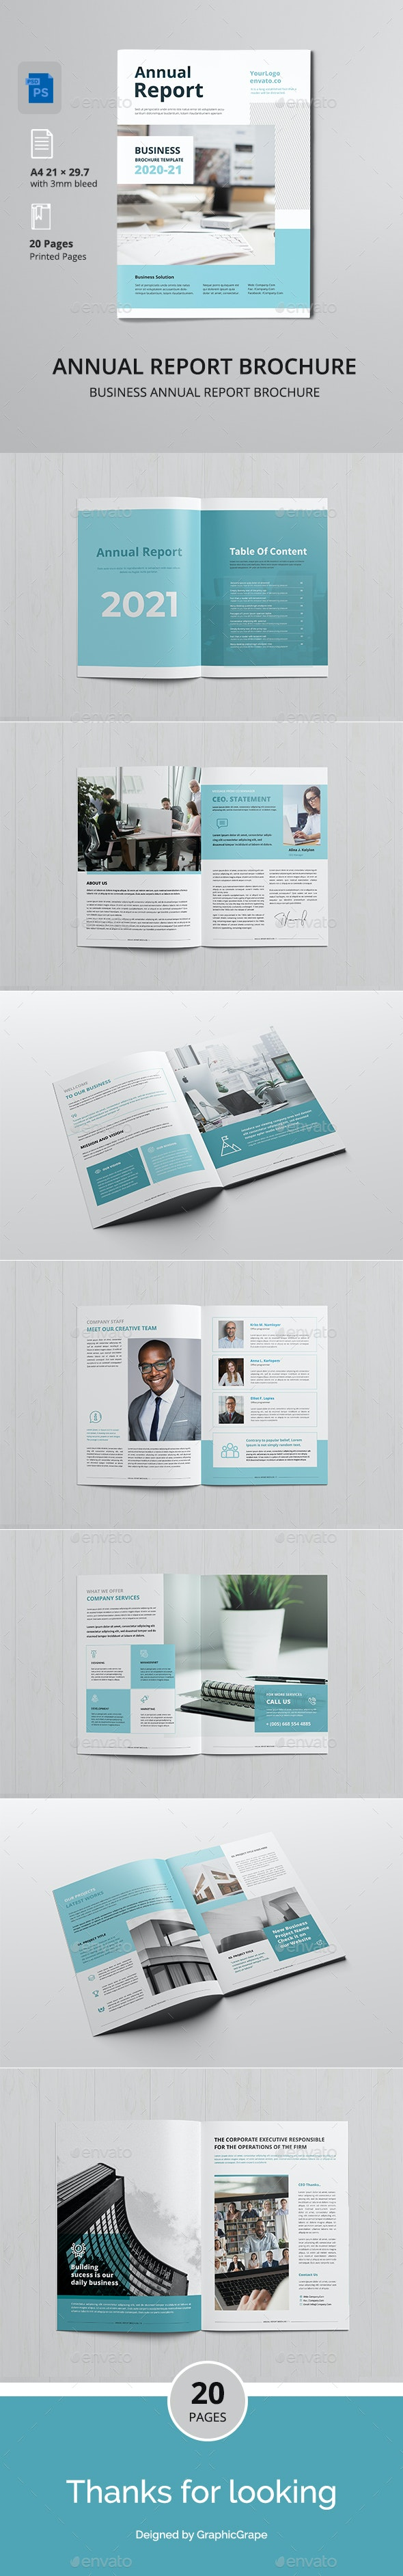 Annual Report Brochure Template - Corporate Brochures